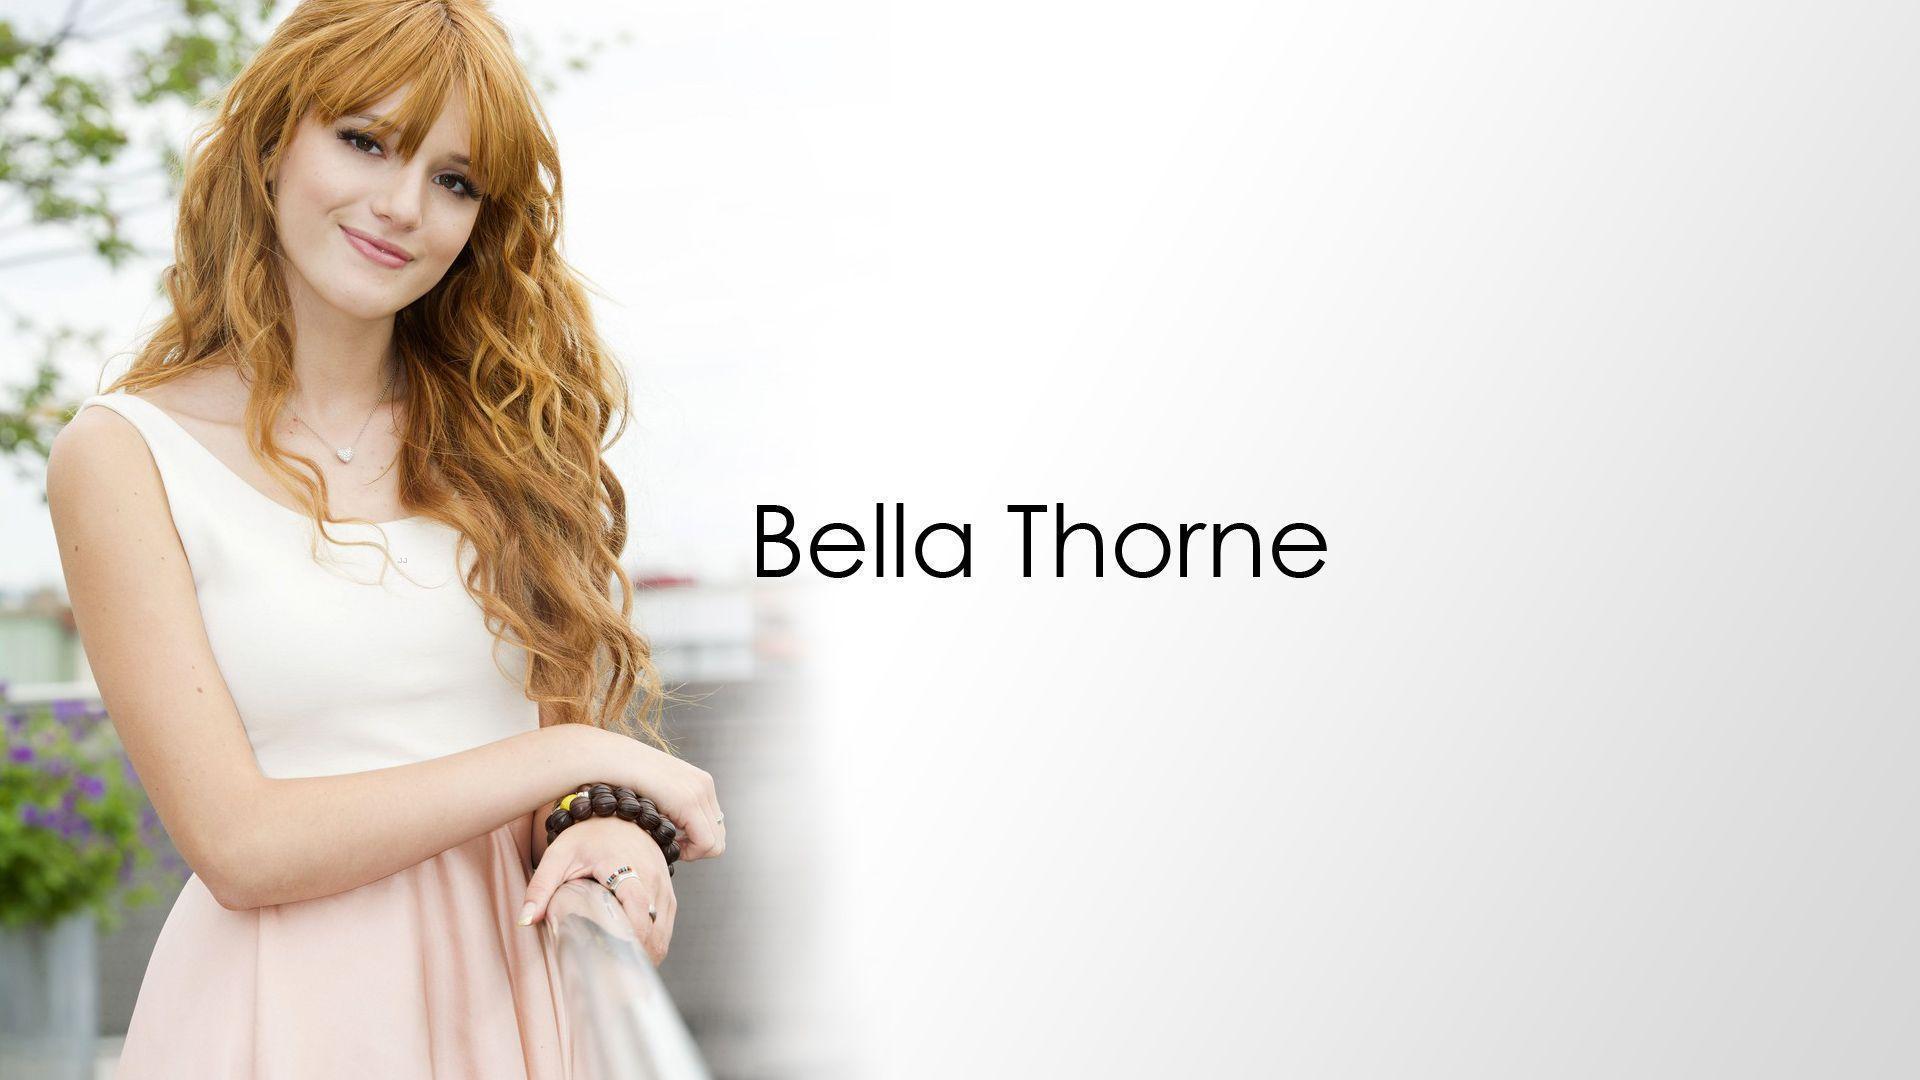 bella thorne wallpaper by -#main